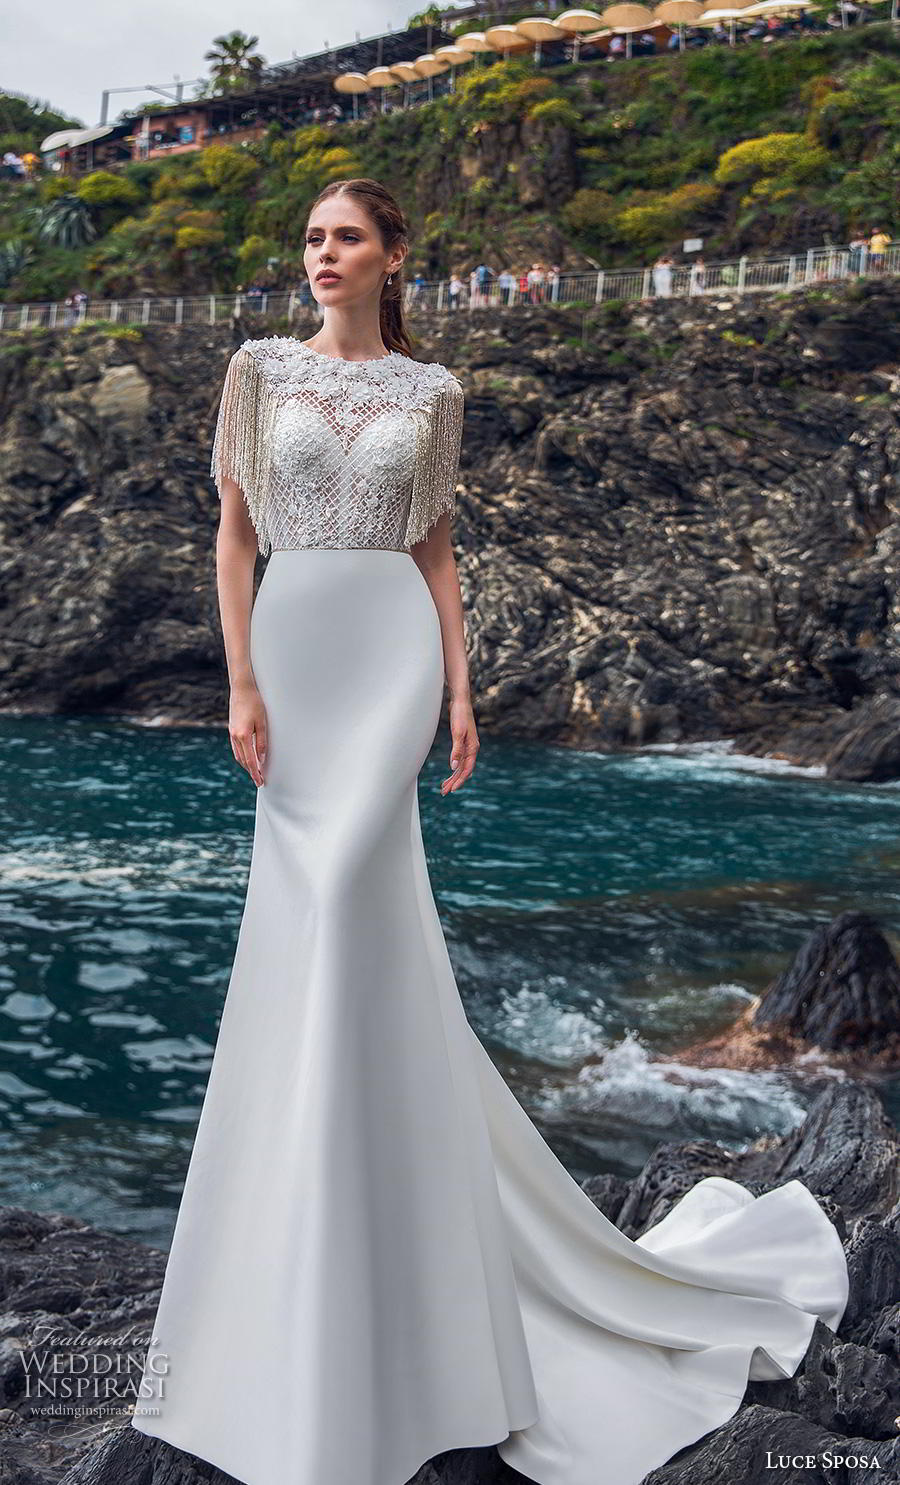 luce sposa 2019 bridal half sleeves jewel neck heavily embellished bodice glitzy elegant fit and flare wedding dress lace back chapel train (11) mv